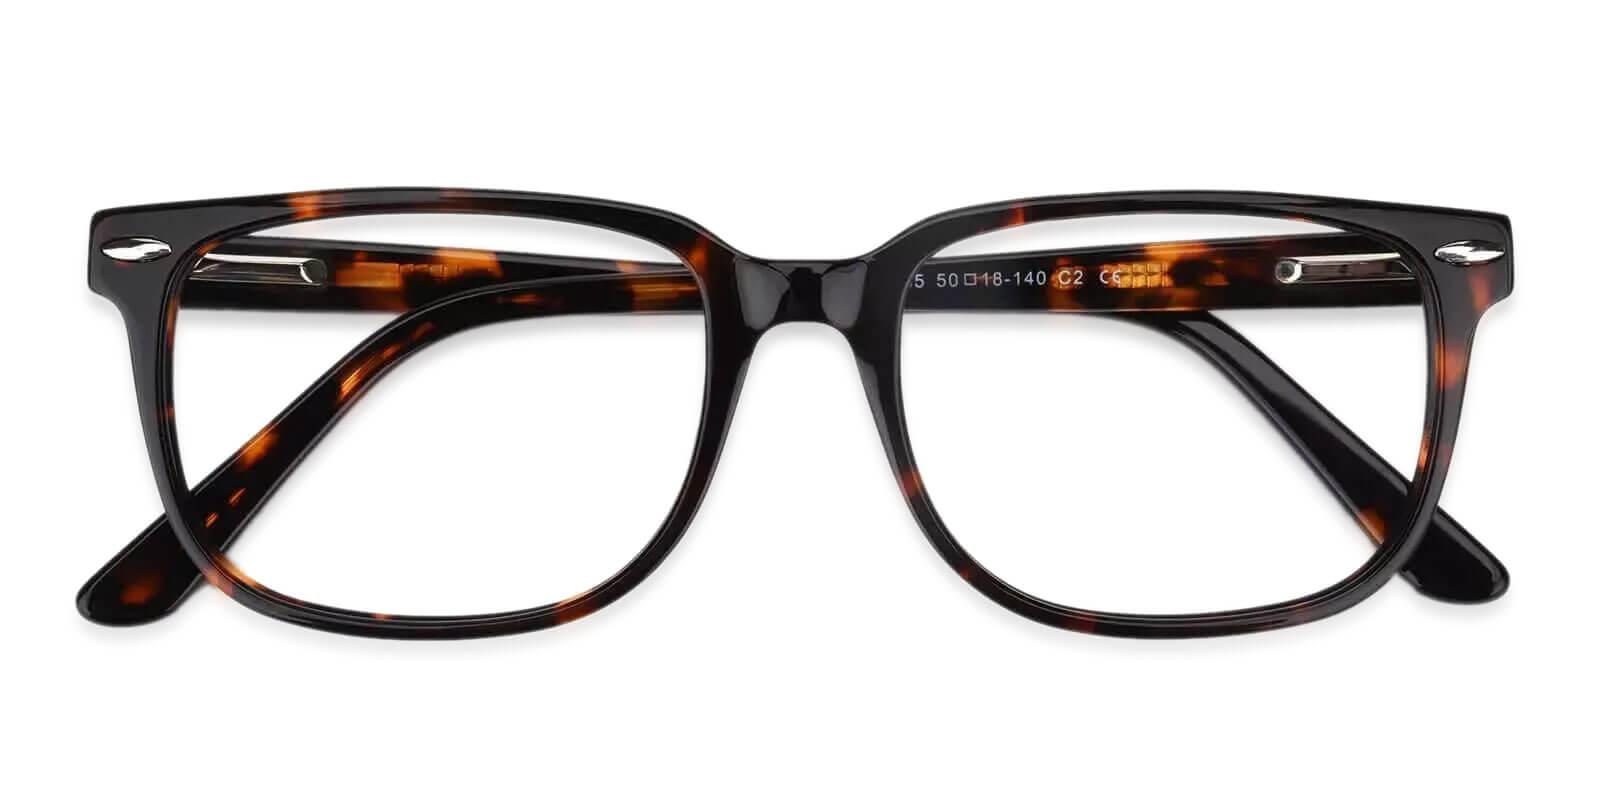 Christy Pattern Acetate Eyeglasses , SpringHinges , UniversalBridgeFit Frames from ABBE Glasses